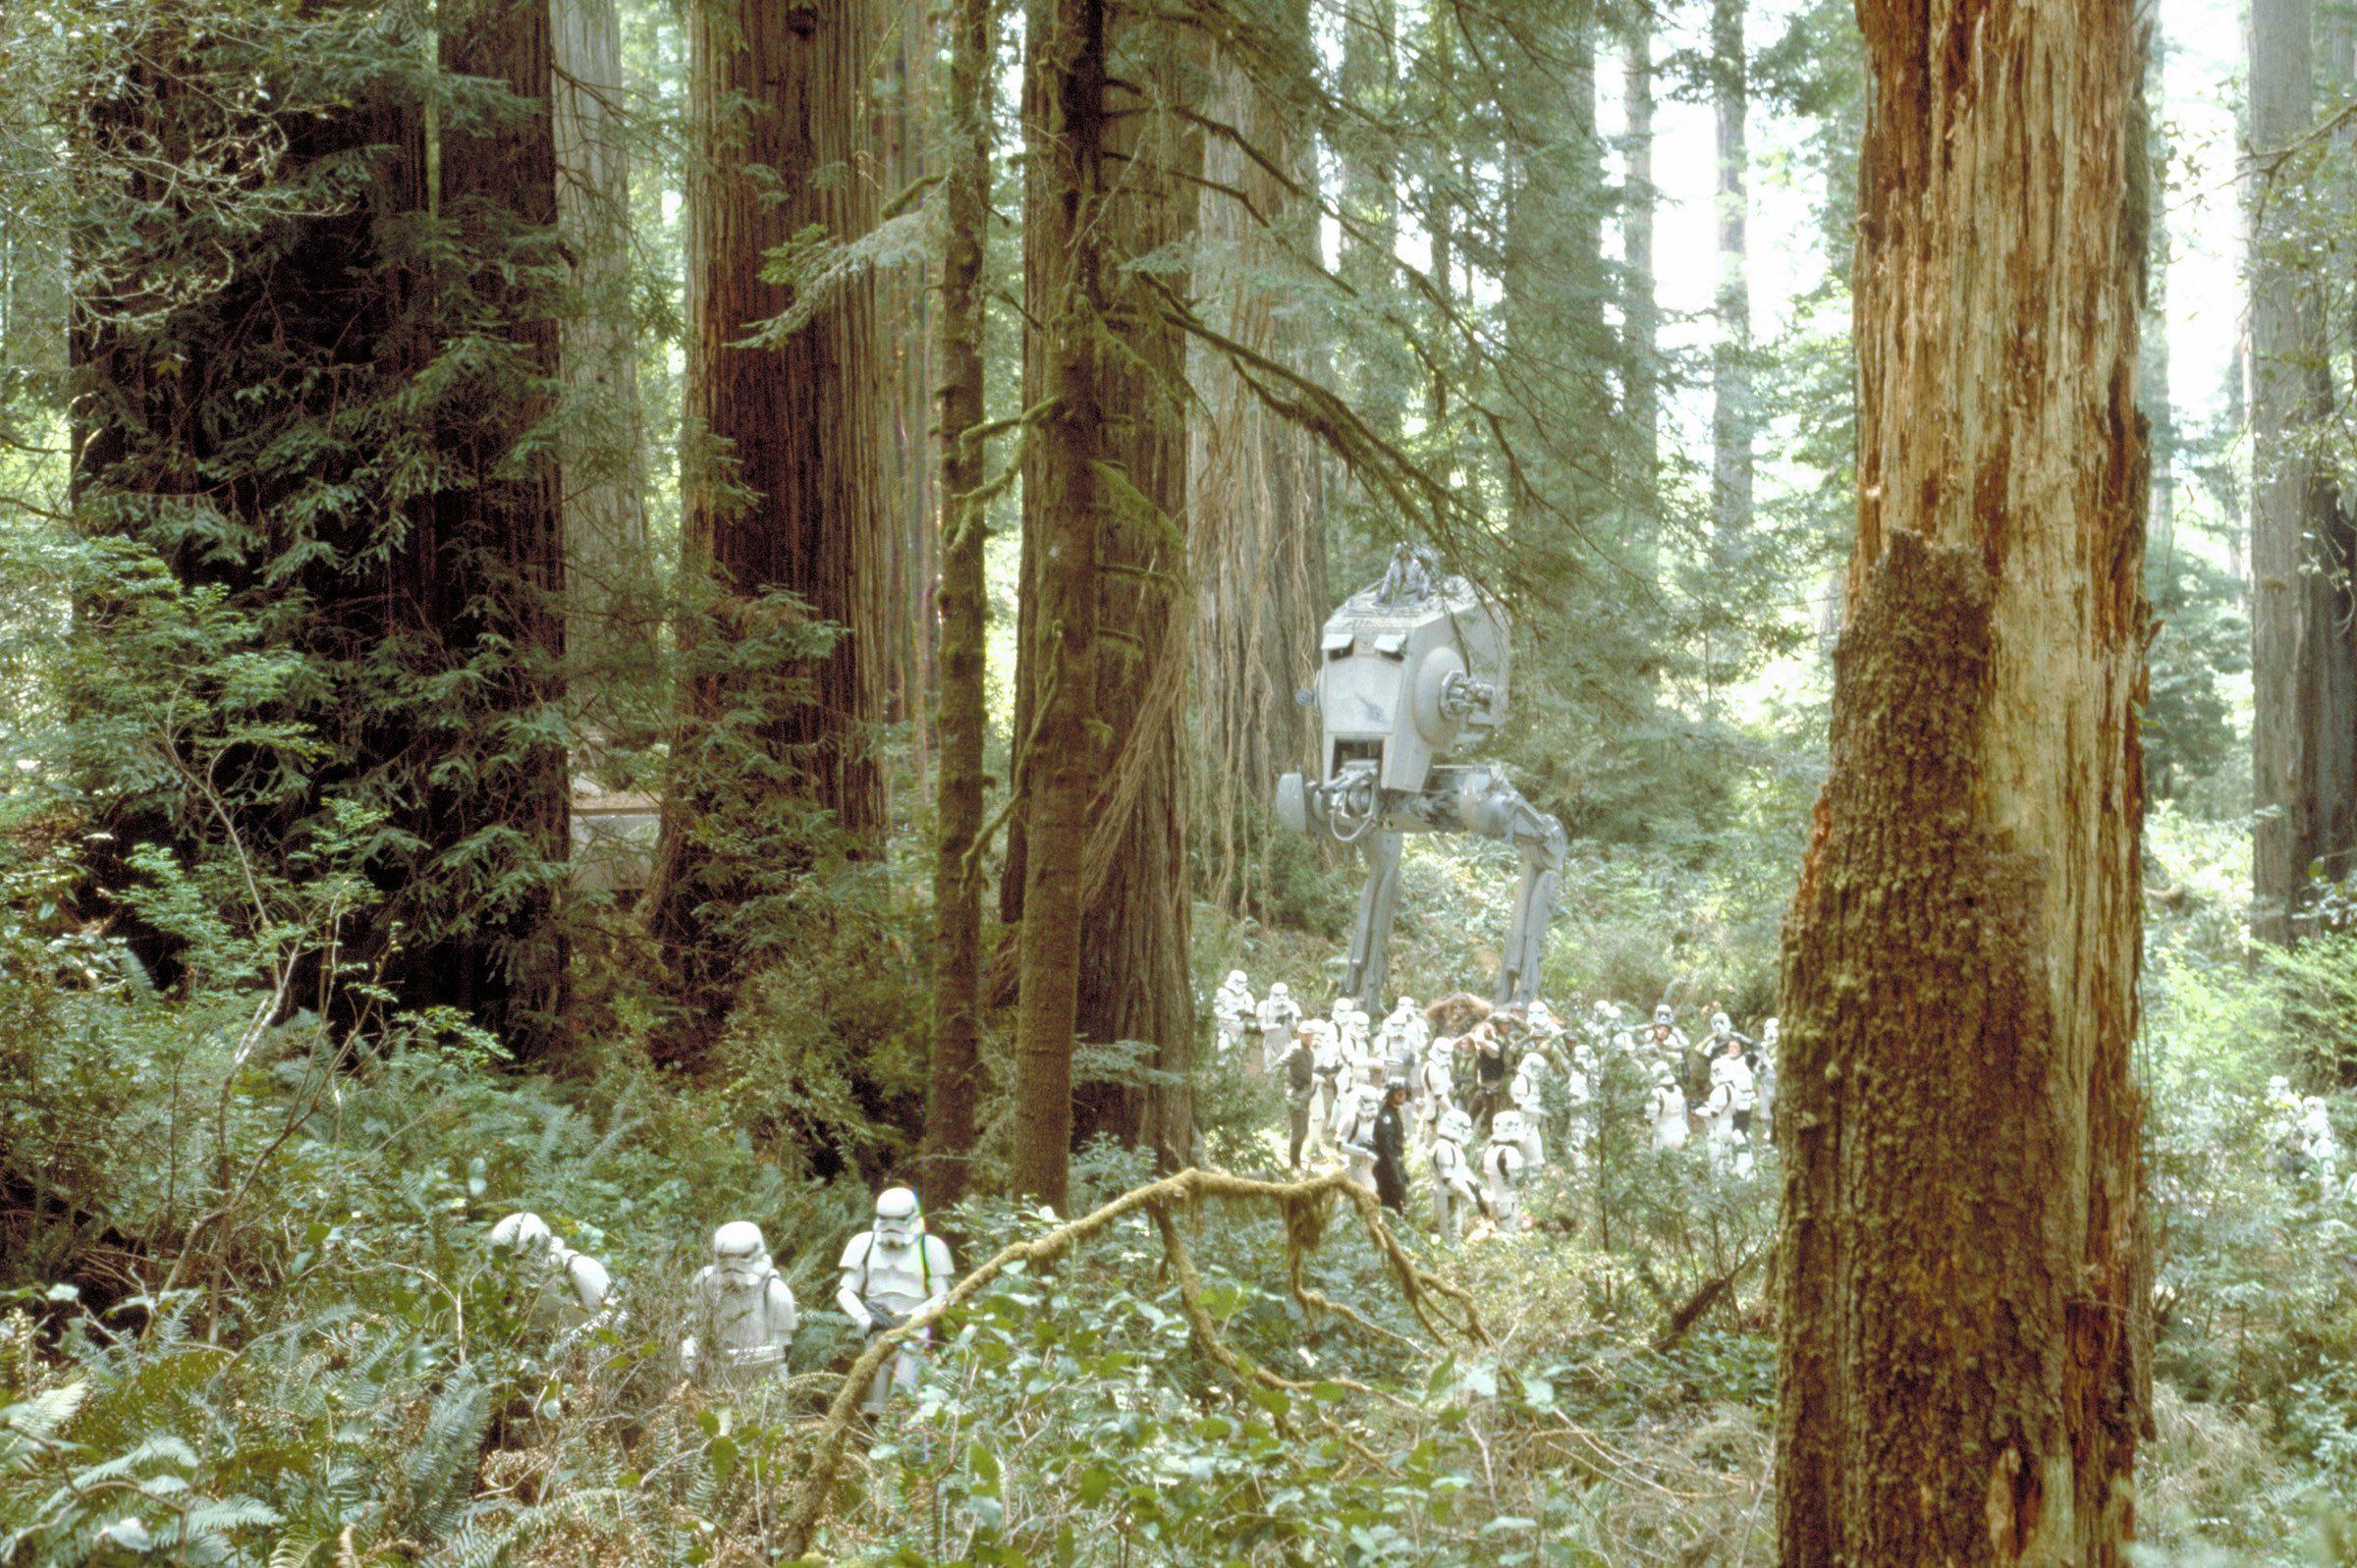 Northern California Redwoods Star wars